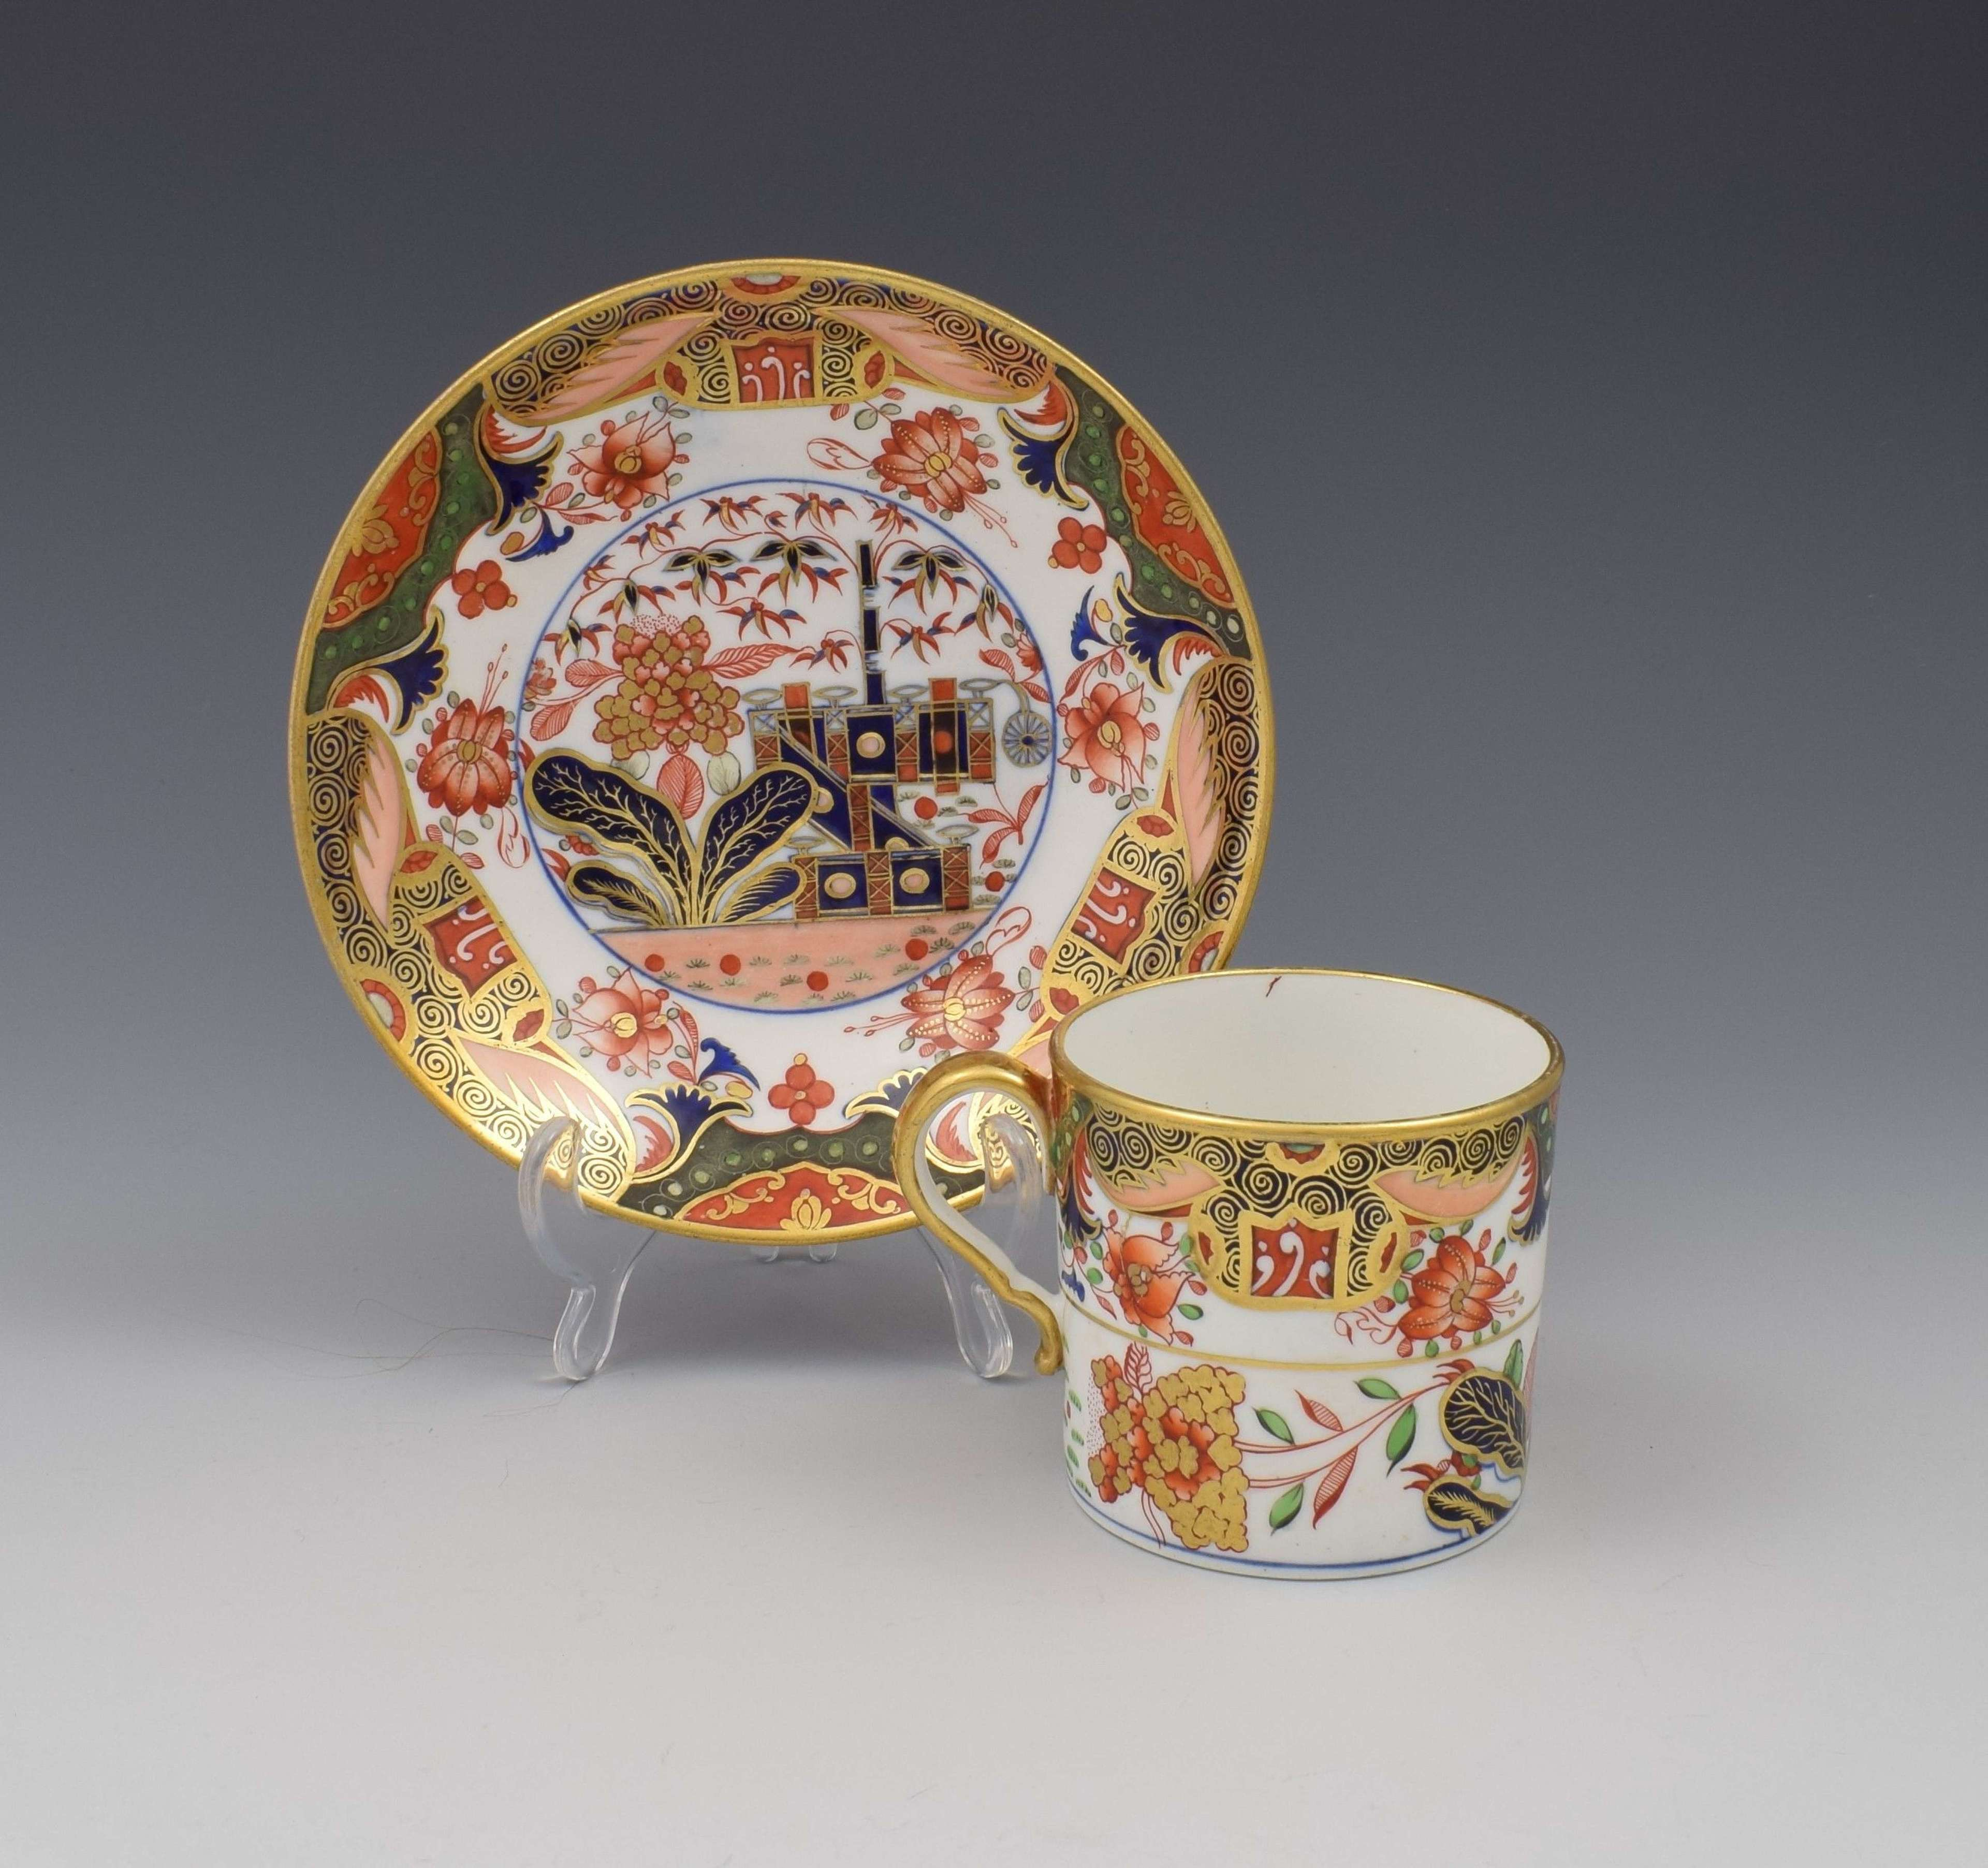 Spode Porcelain Imari Coffee can & Saucer Pattern 967 c.1810